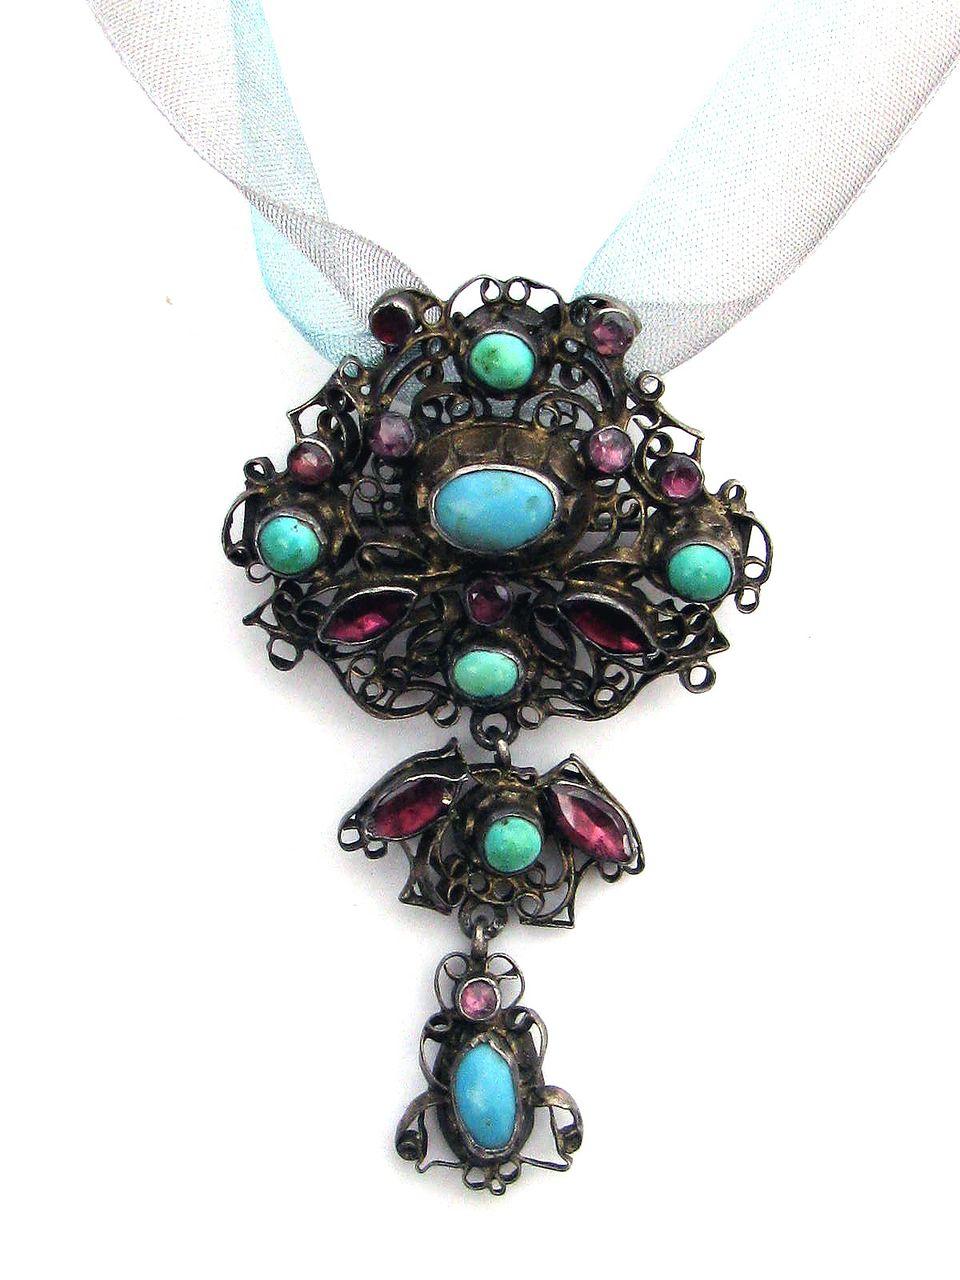 WOW! XL Georgian Austro-Hungarian Turquoise/Garnet/Silver Gilt Pendant/Brooch, c.1790!